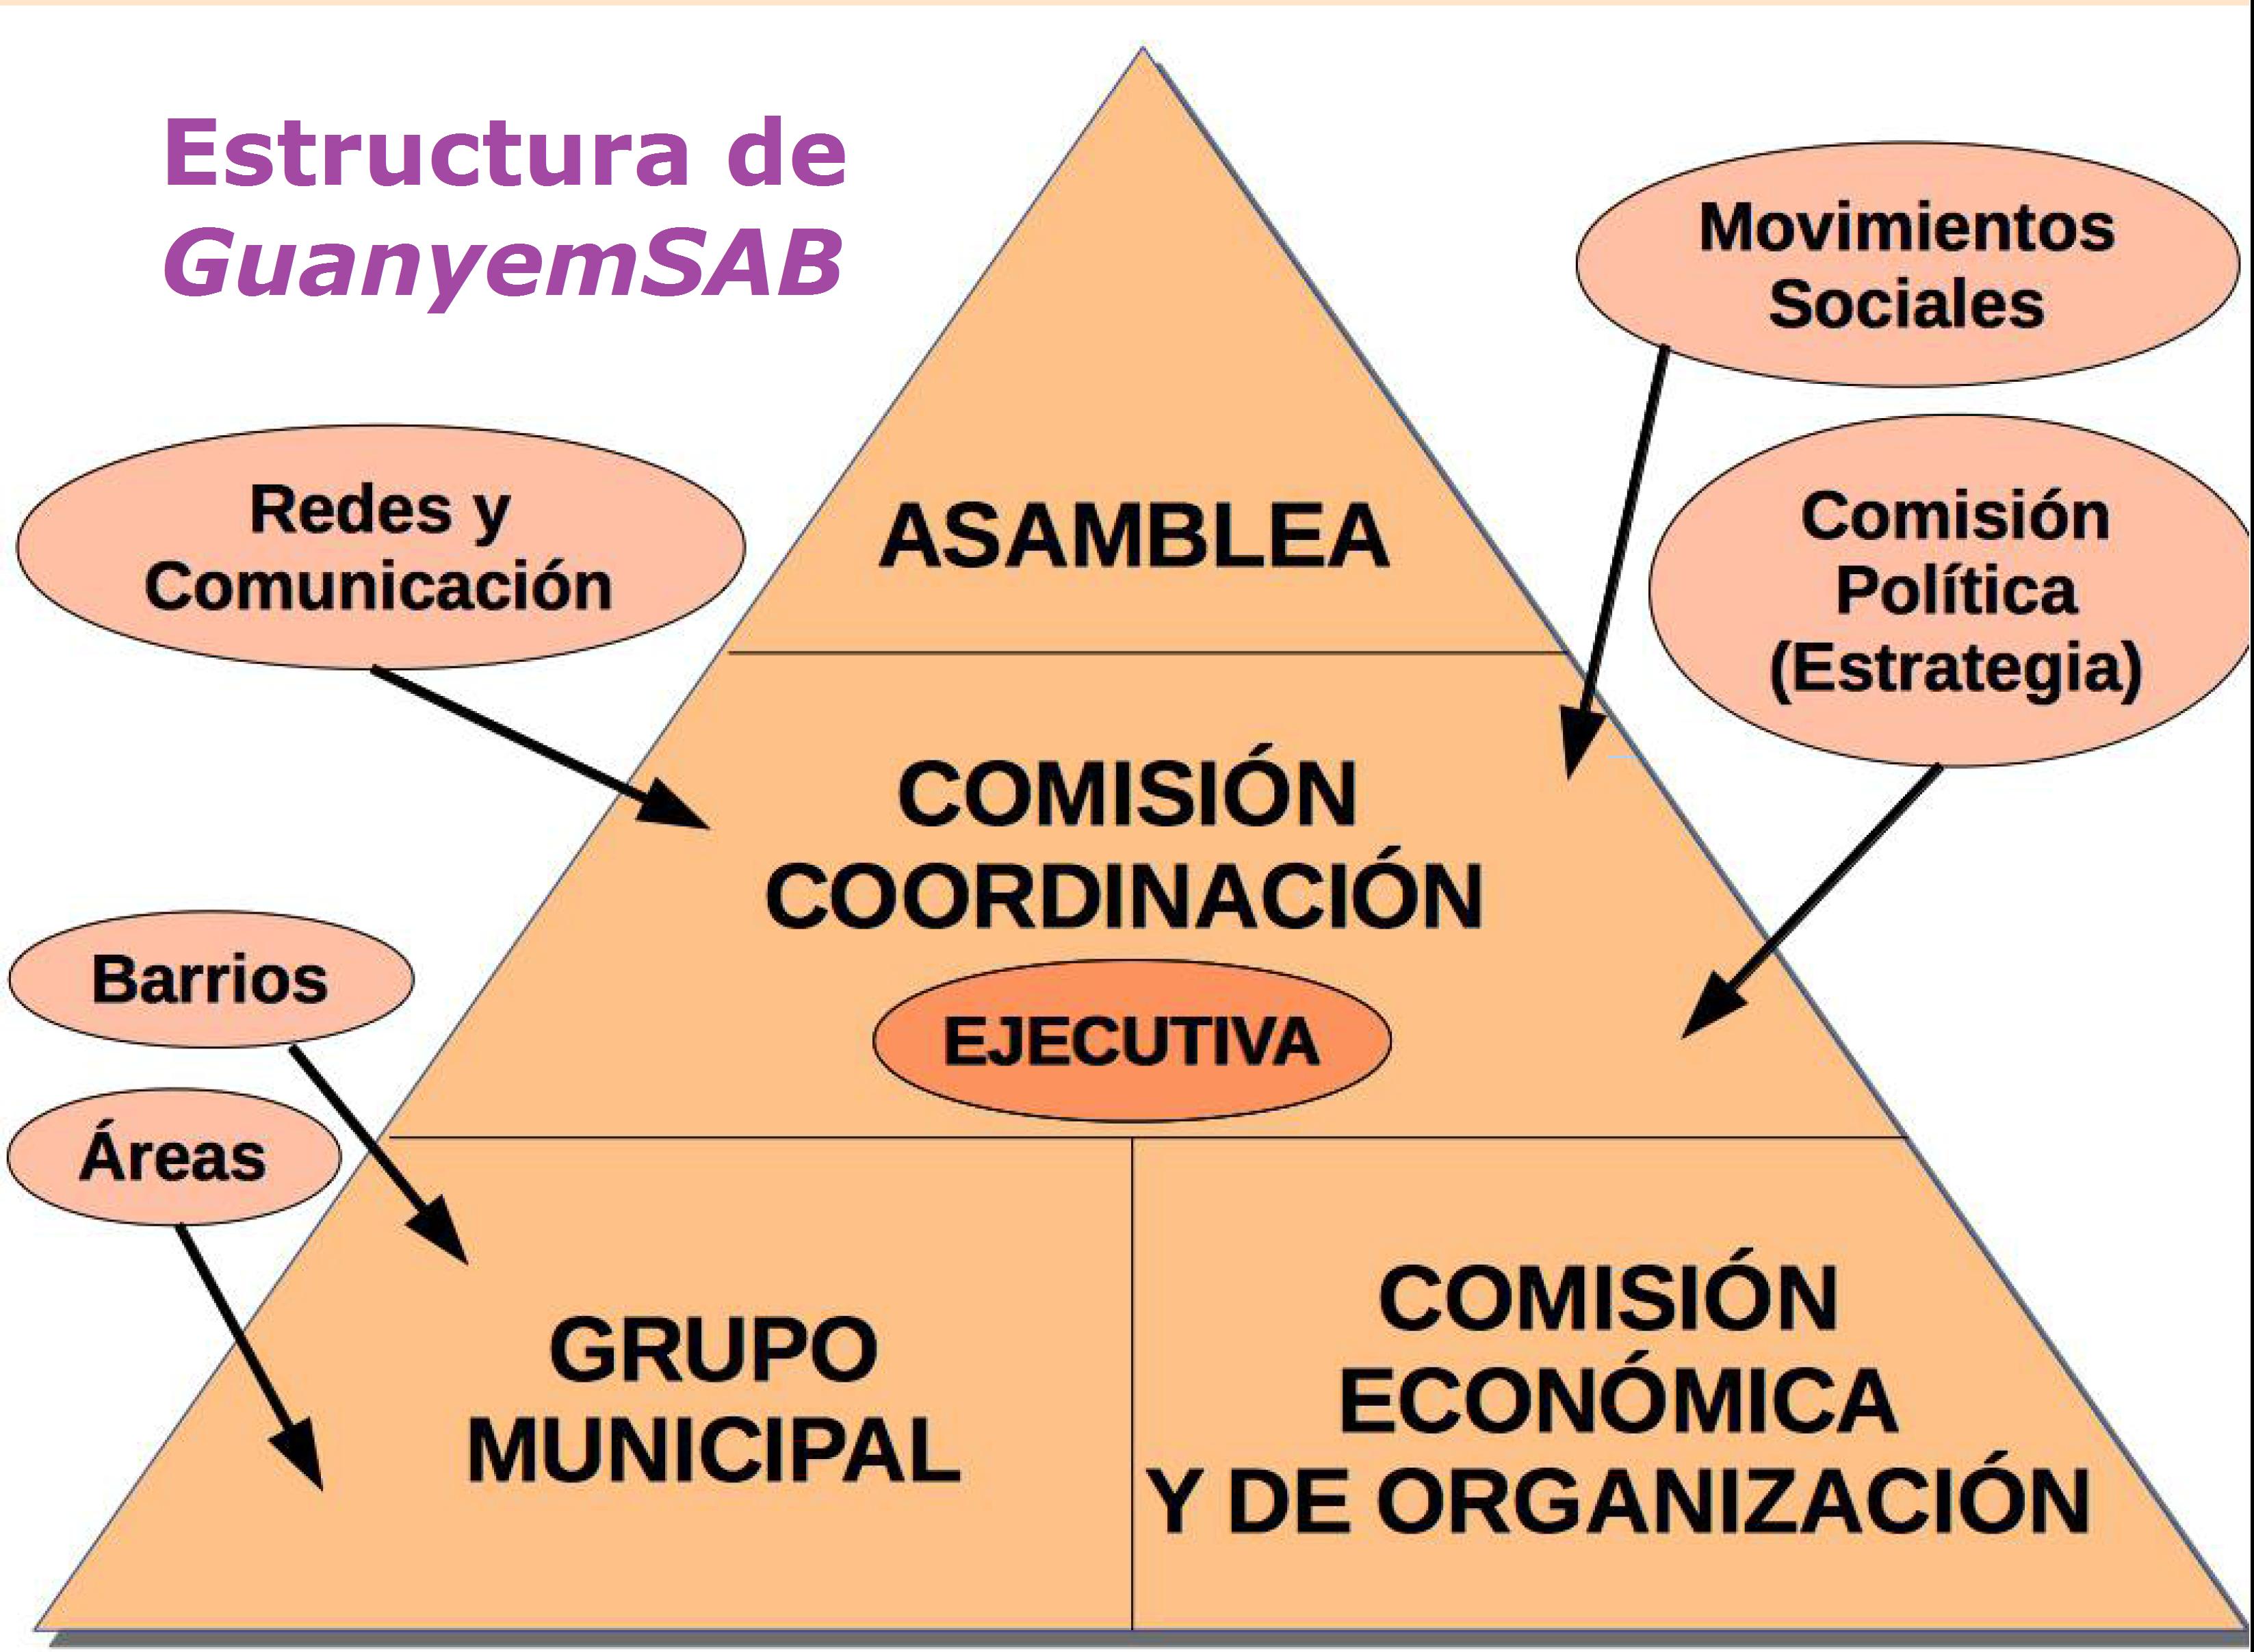 Estructura GuanyemSAB